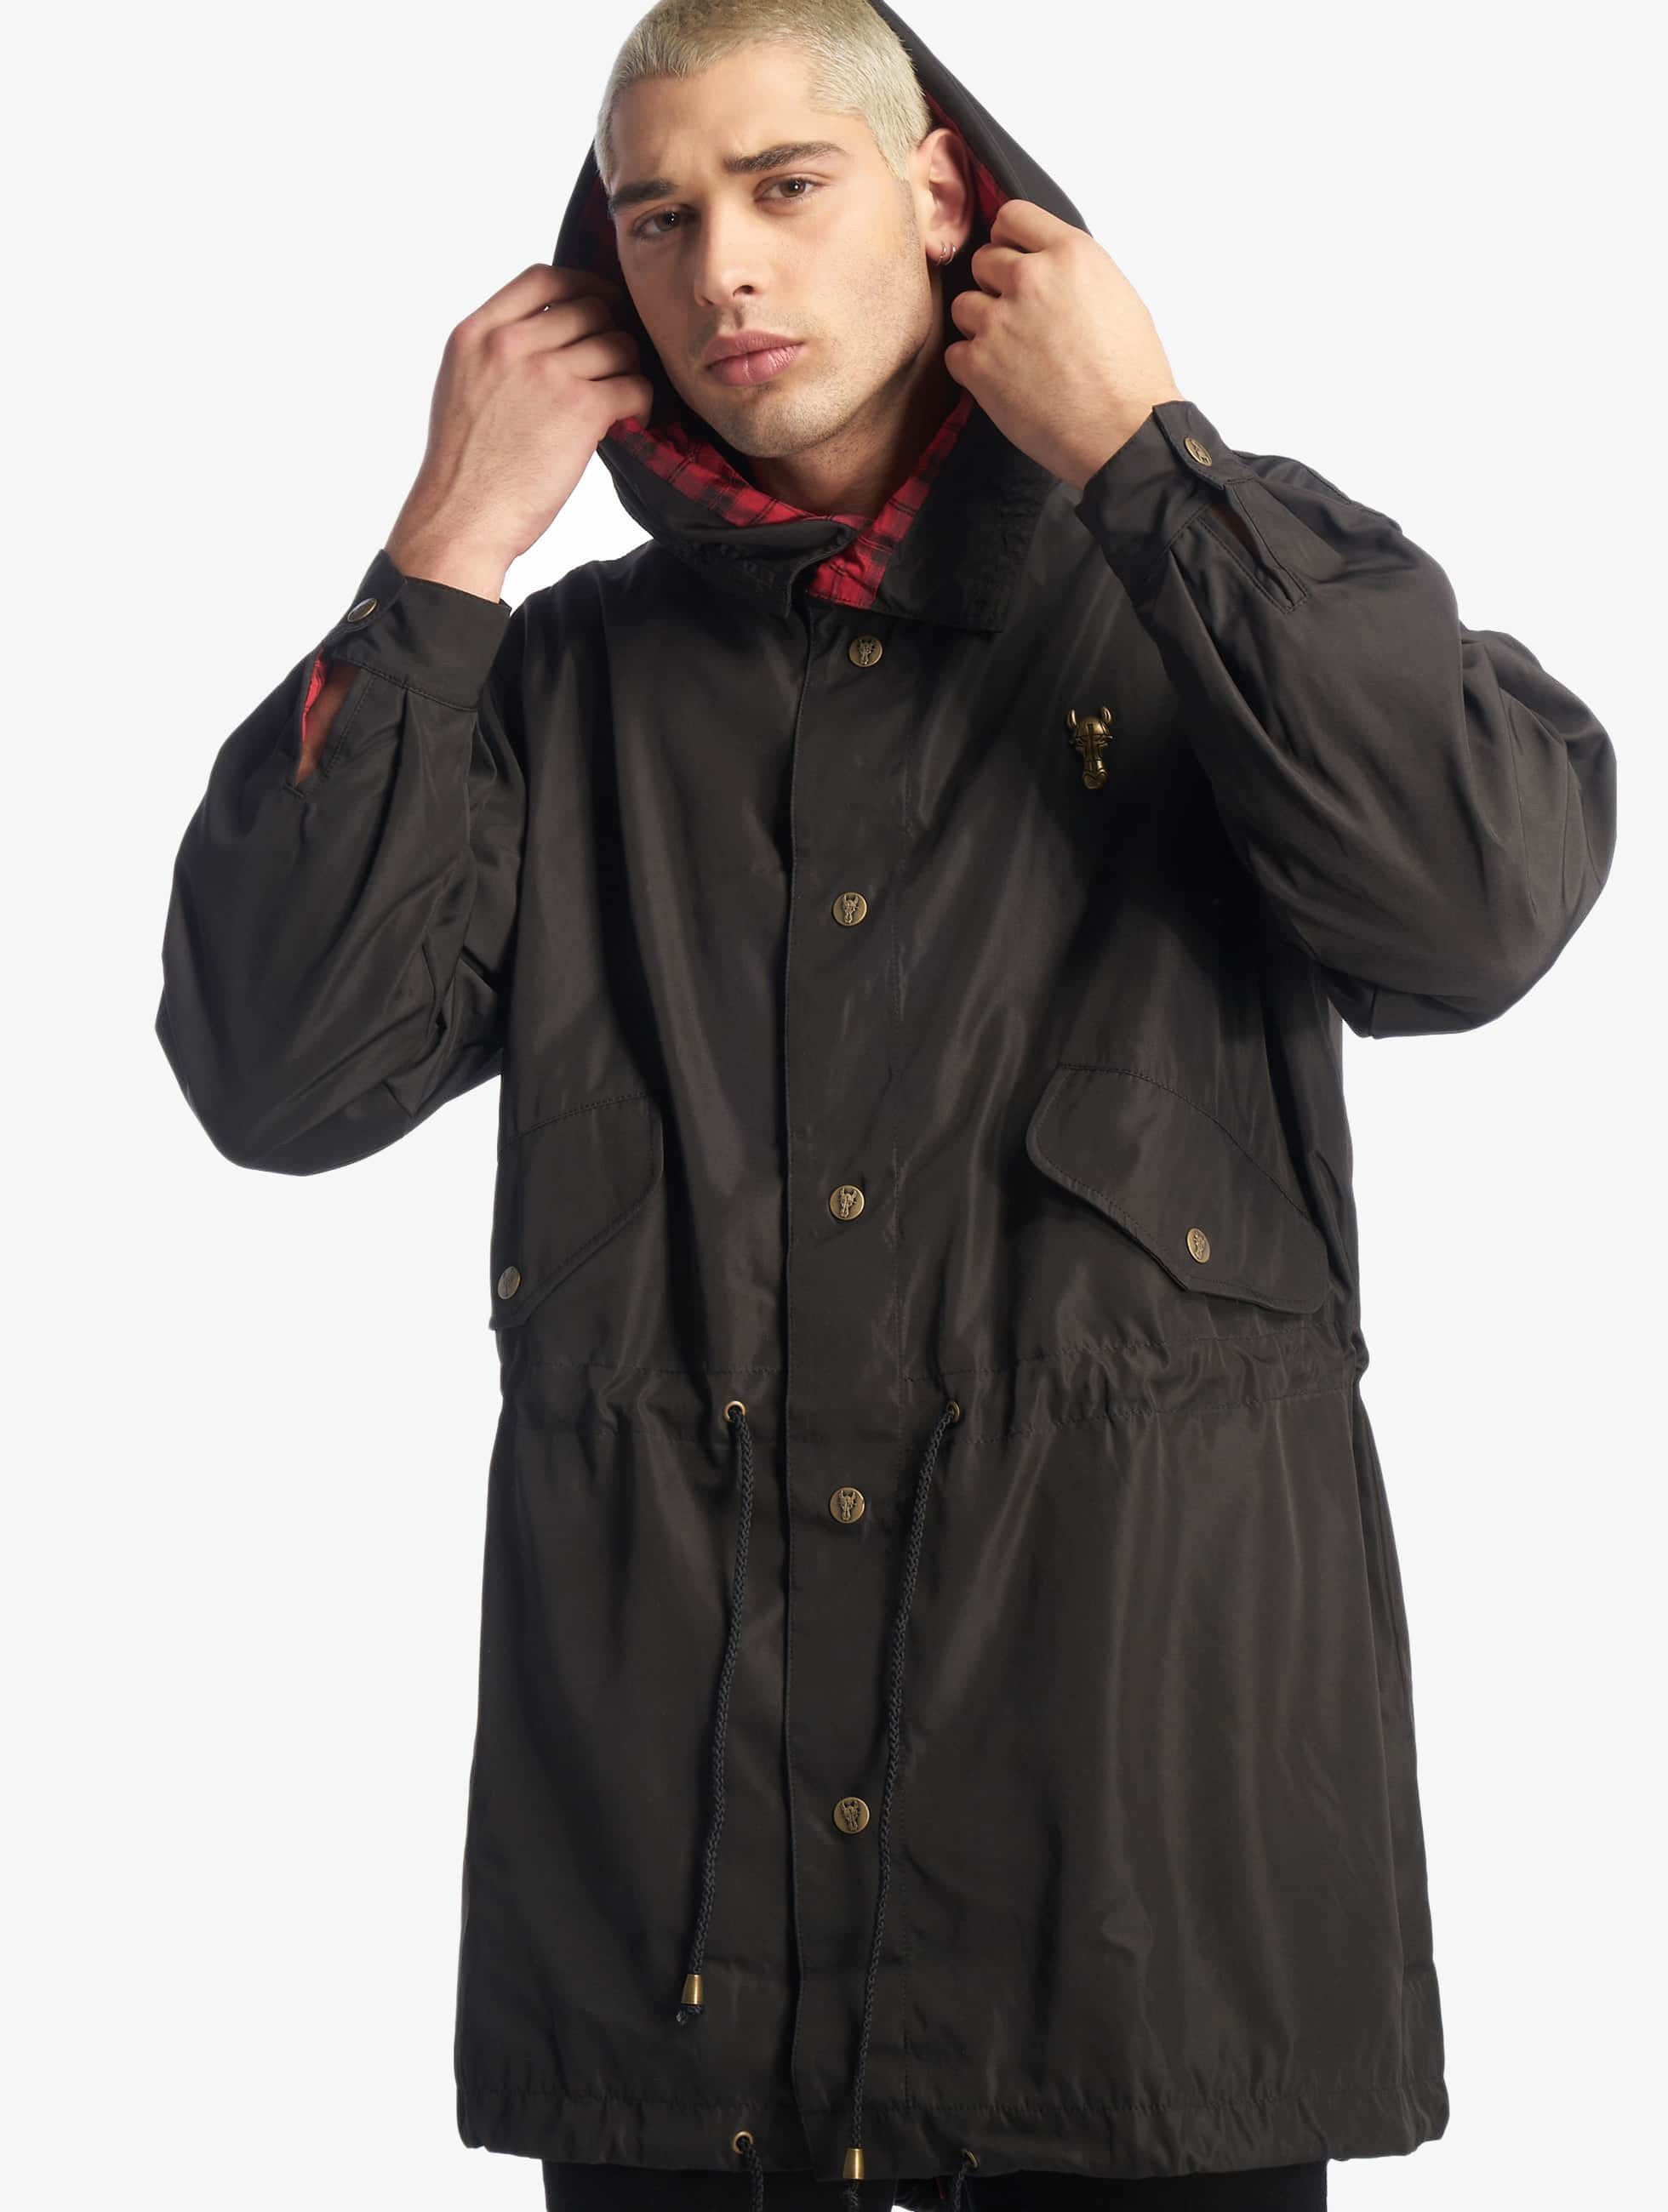 Cavallo de Ferro / Lightweight Jacket Mono in black XL